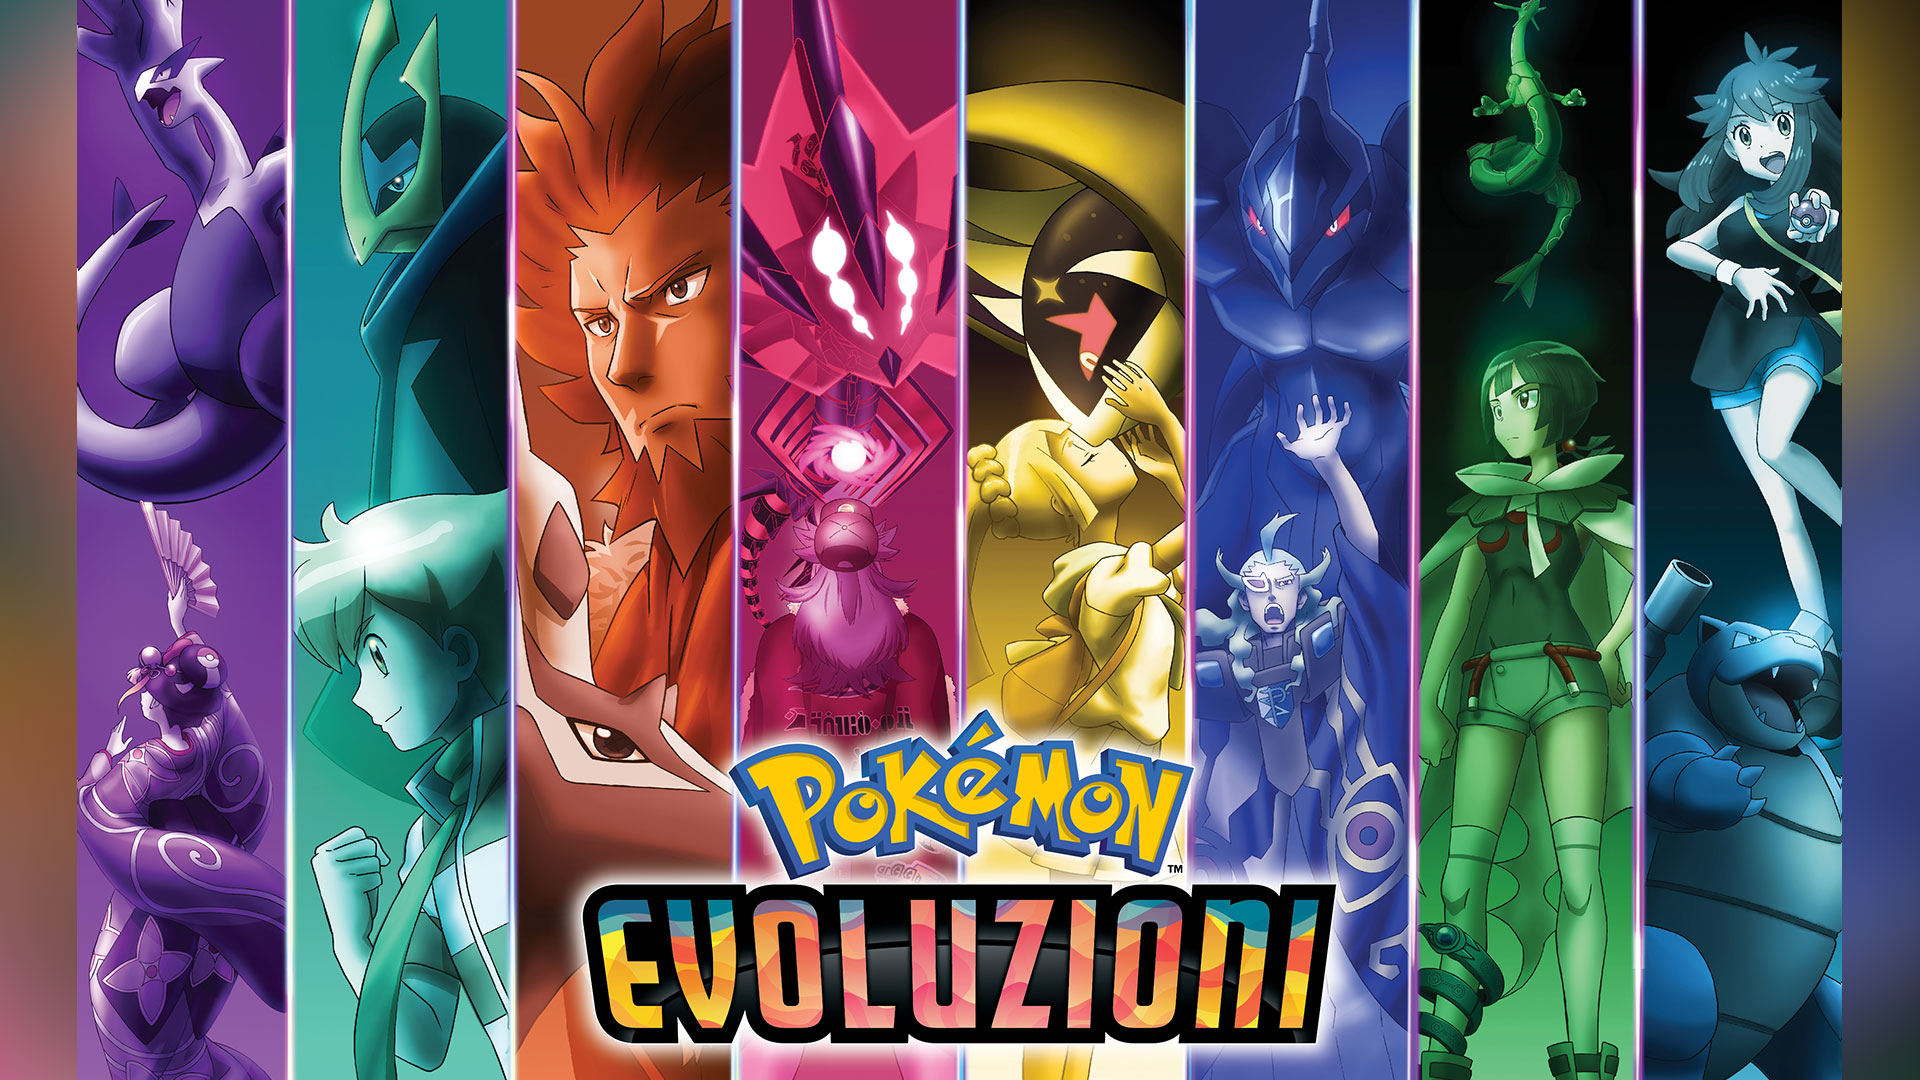 evolutions promo it